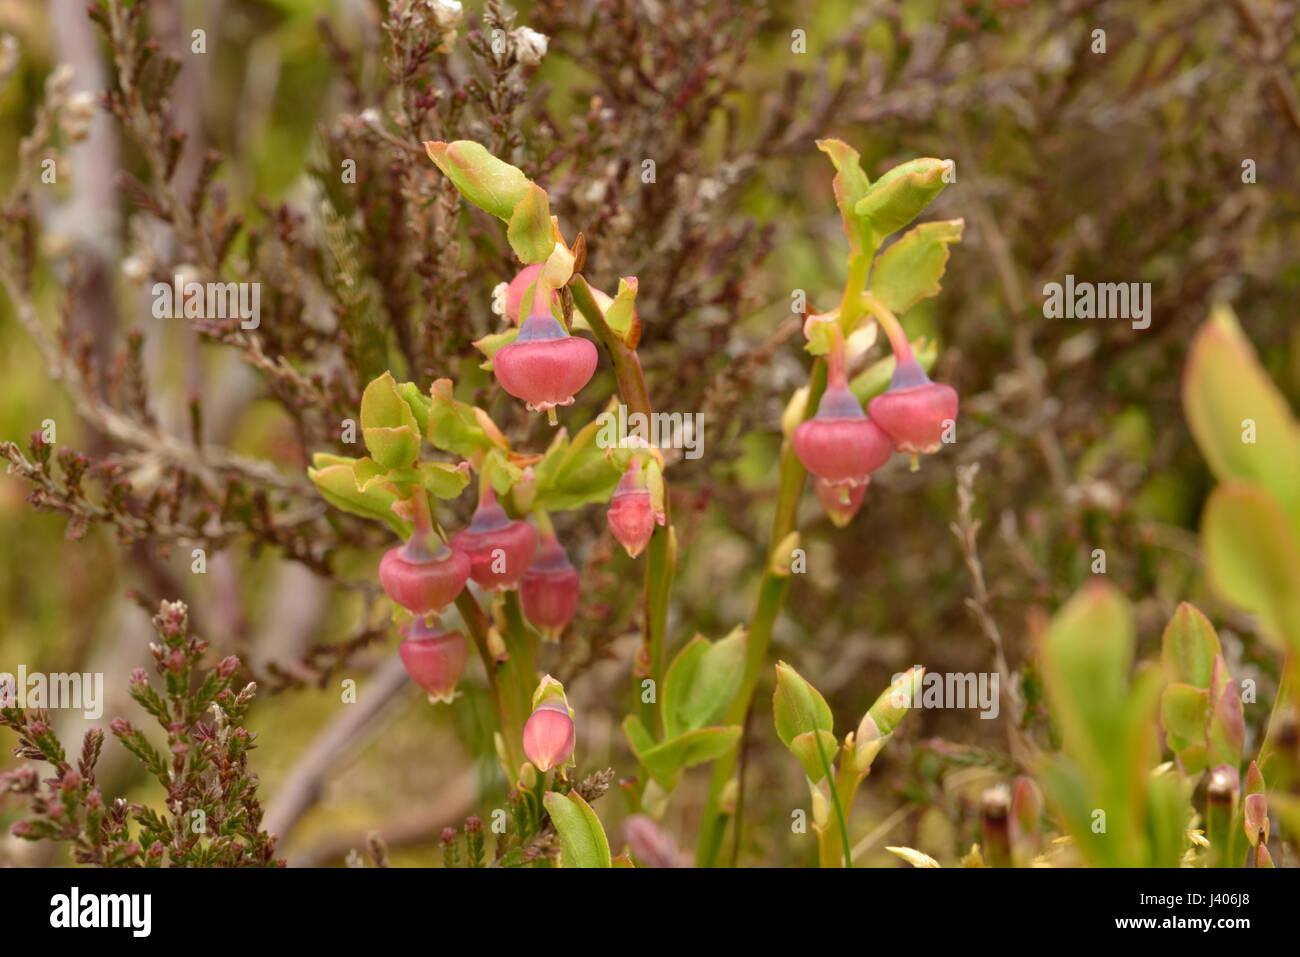 Bilberry, Vaccinium myrtillus - Stock Image